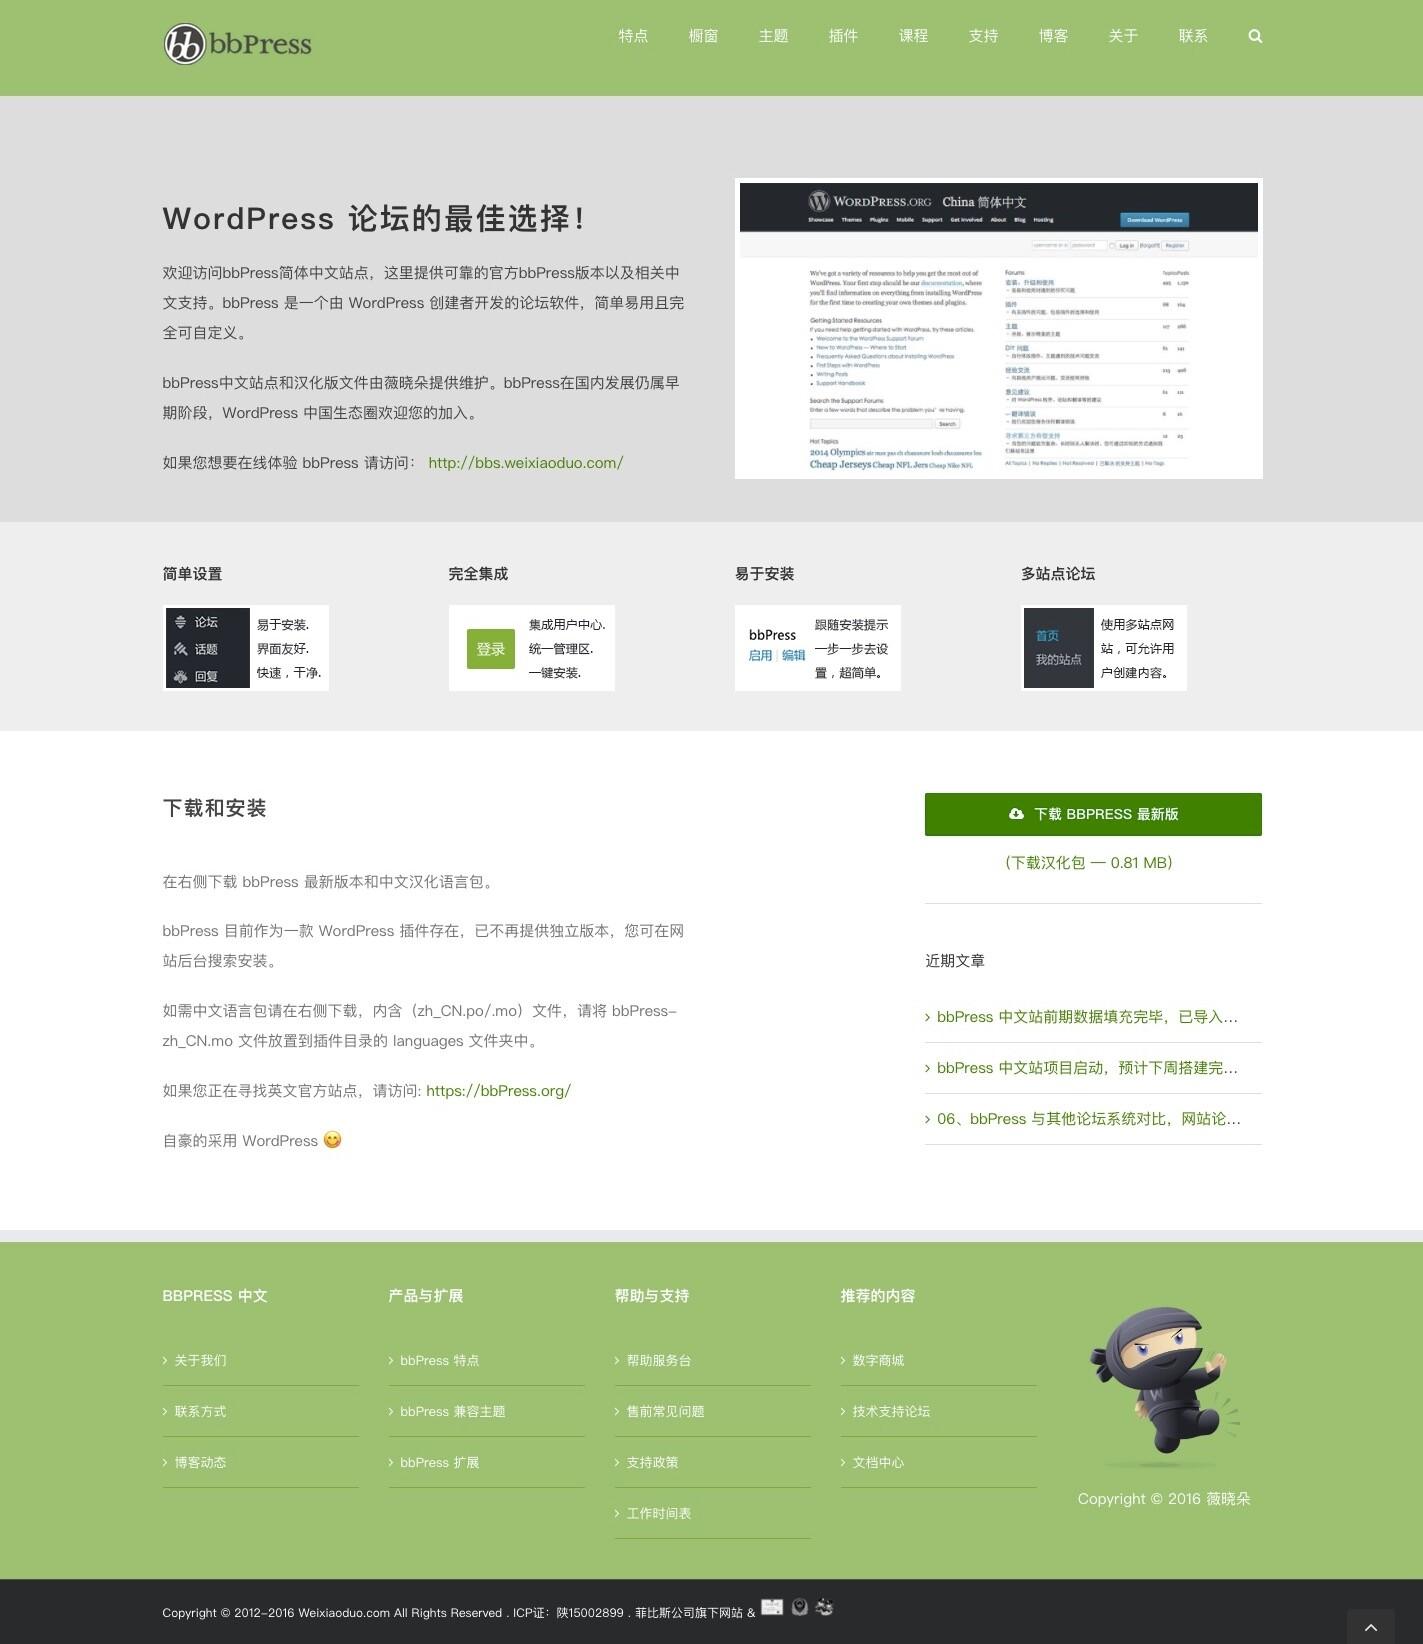 bbPress 中文